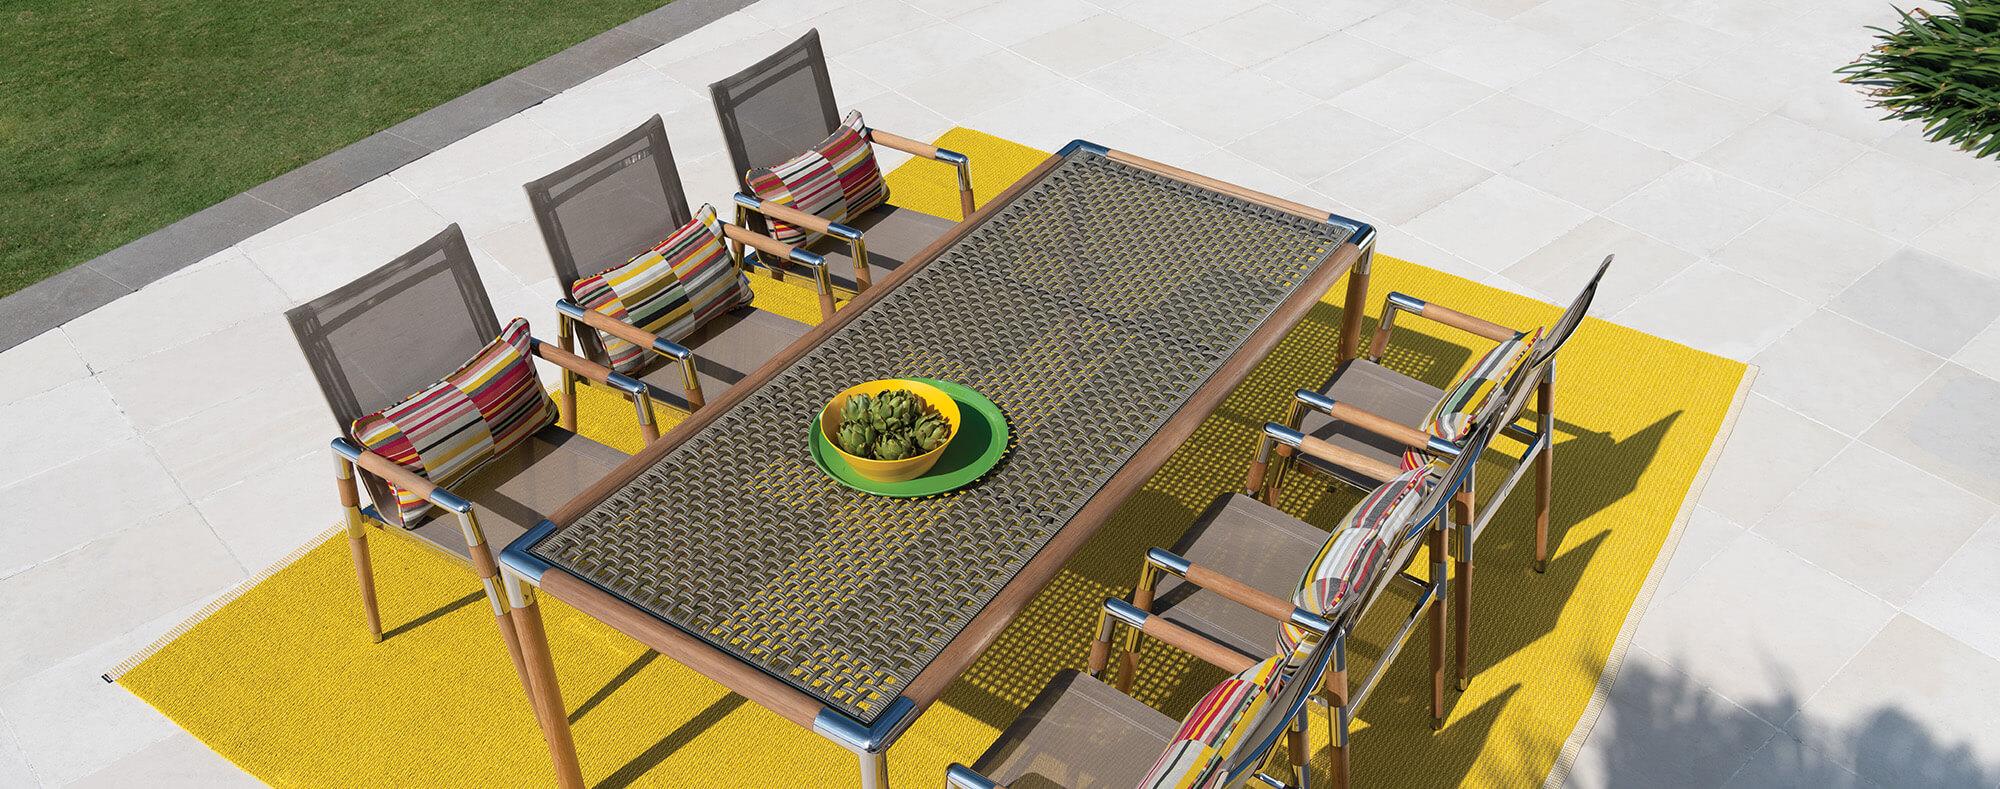 Marina designer outdoor table